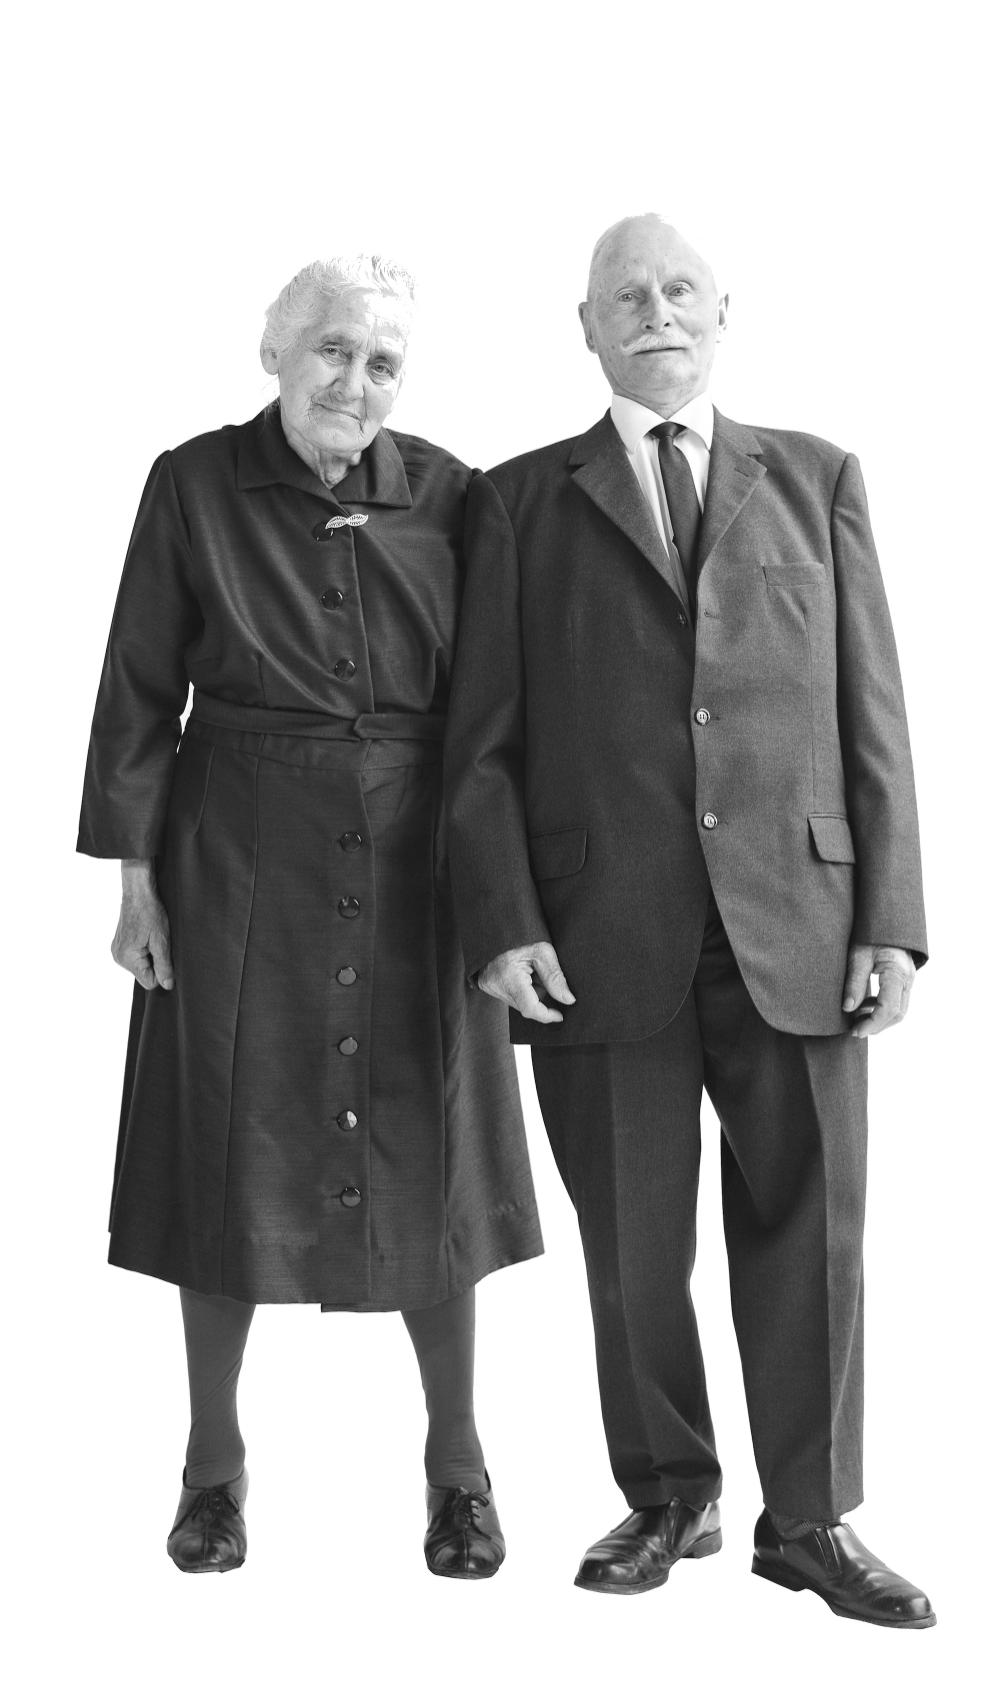 Beate Rose, Landwirtsfrau 79. Landwirt 84, 1971